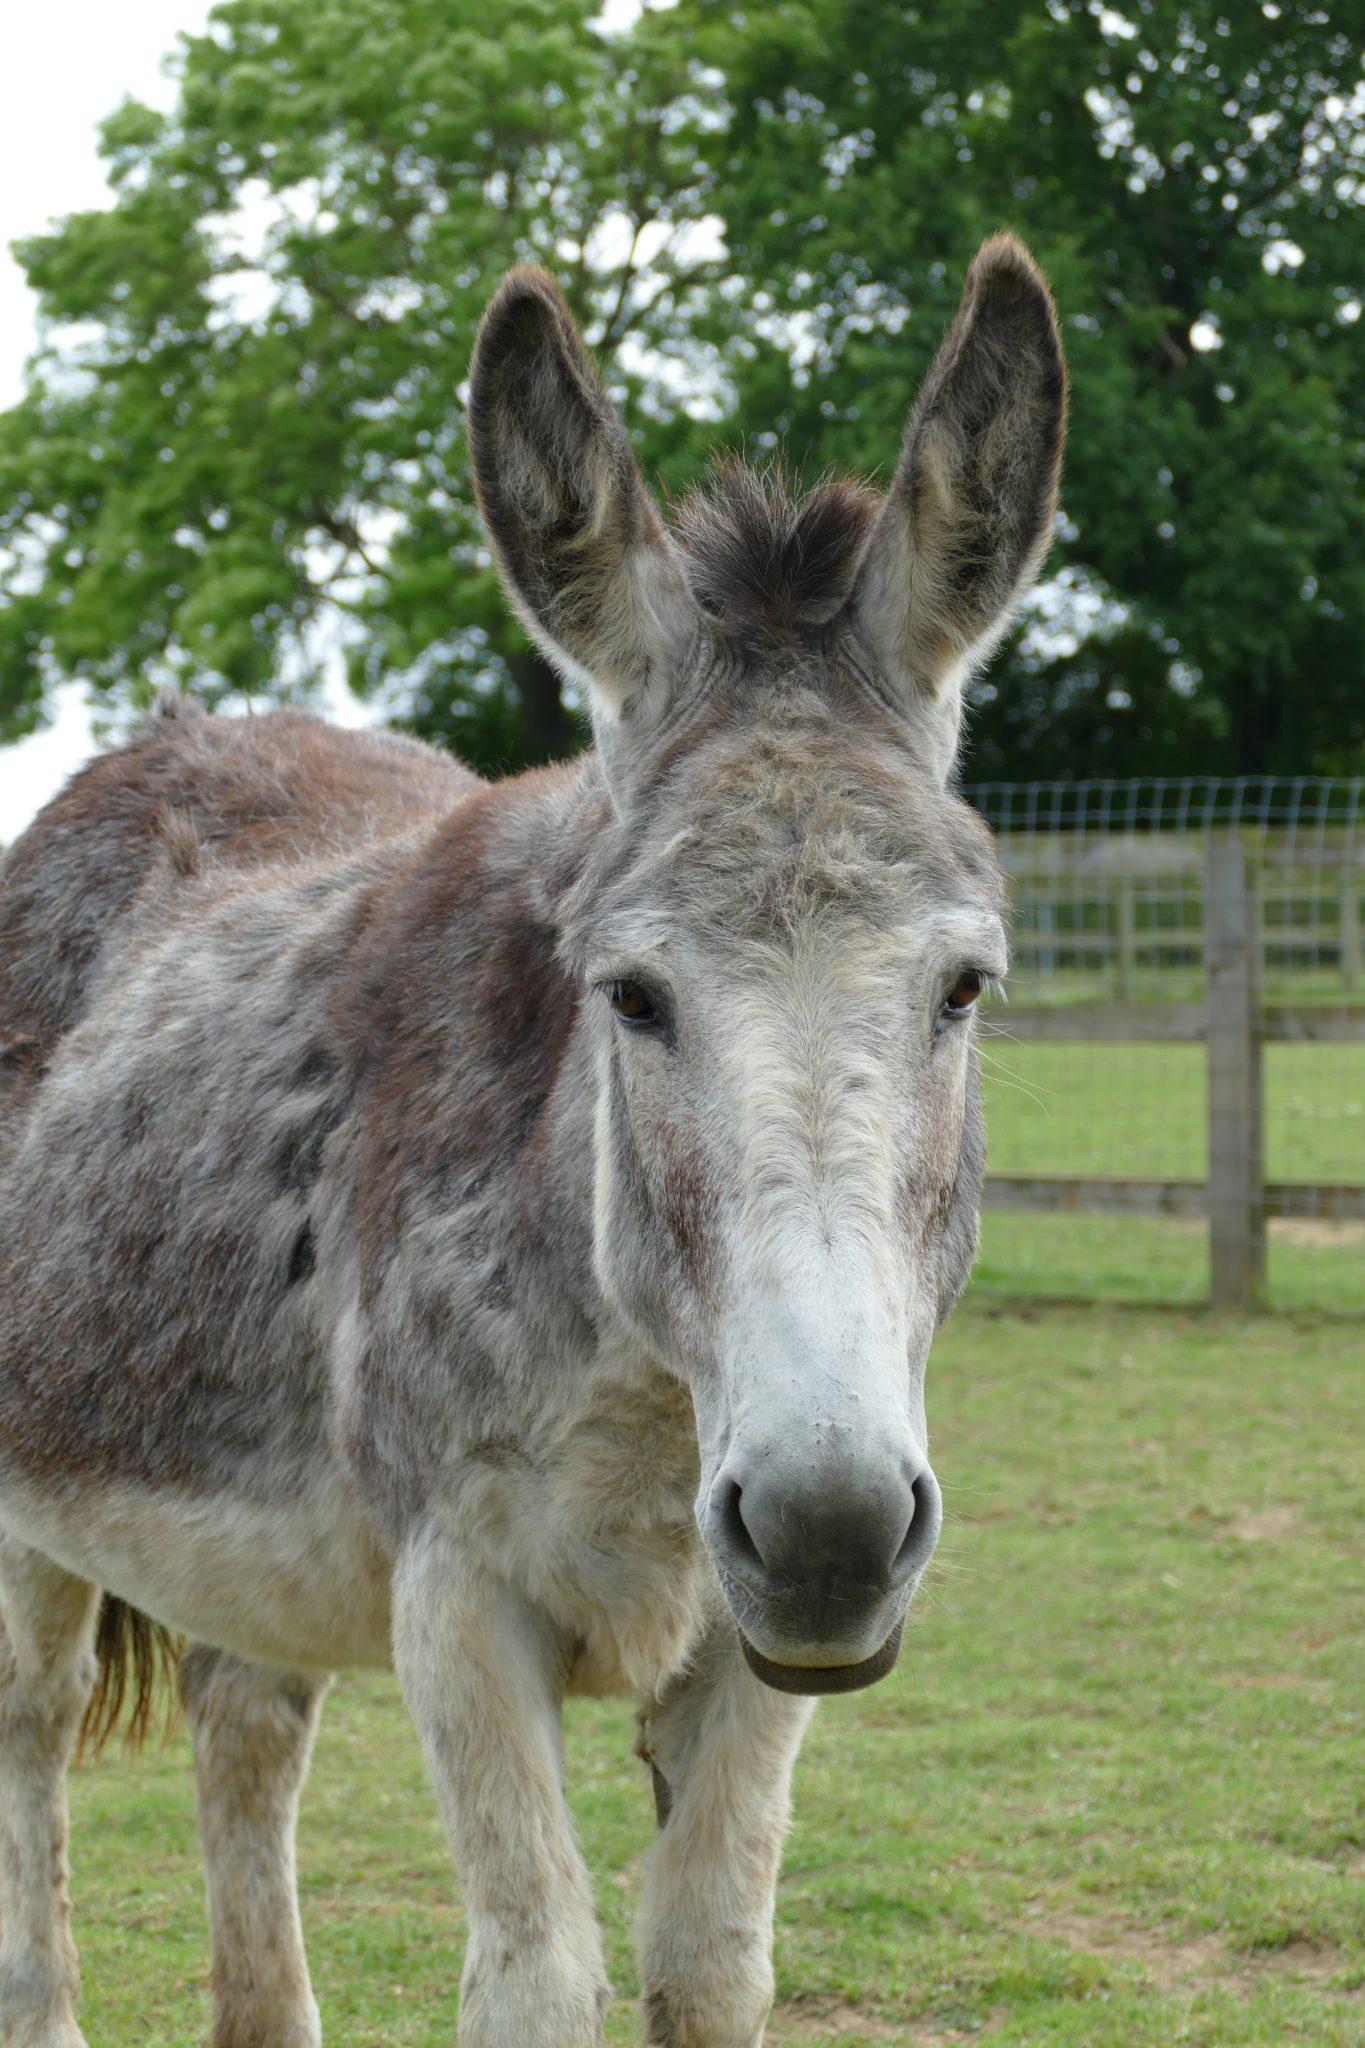 bluebell-wonkey-donkey-visitors-centre